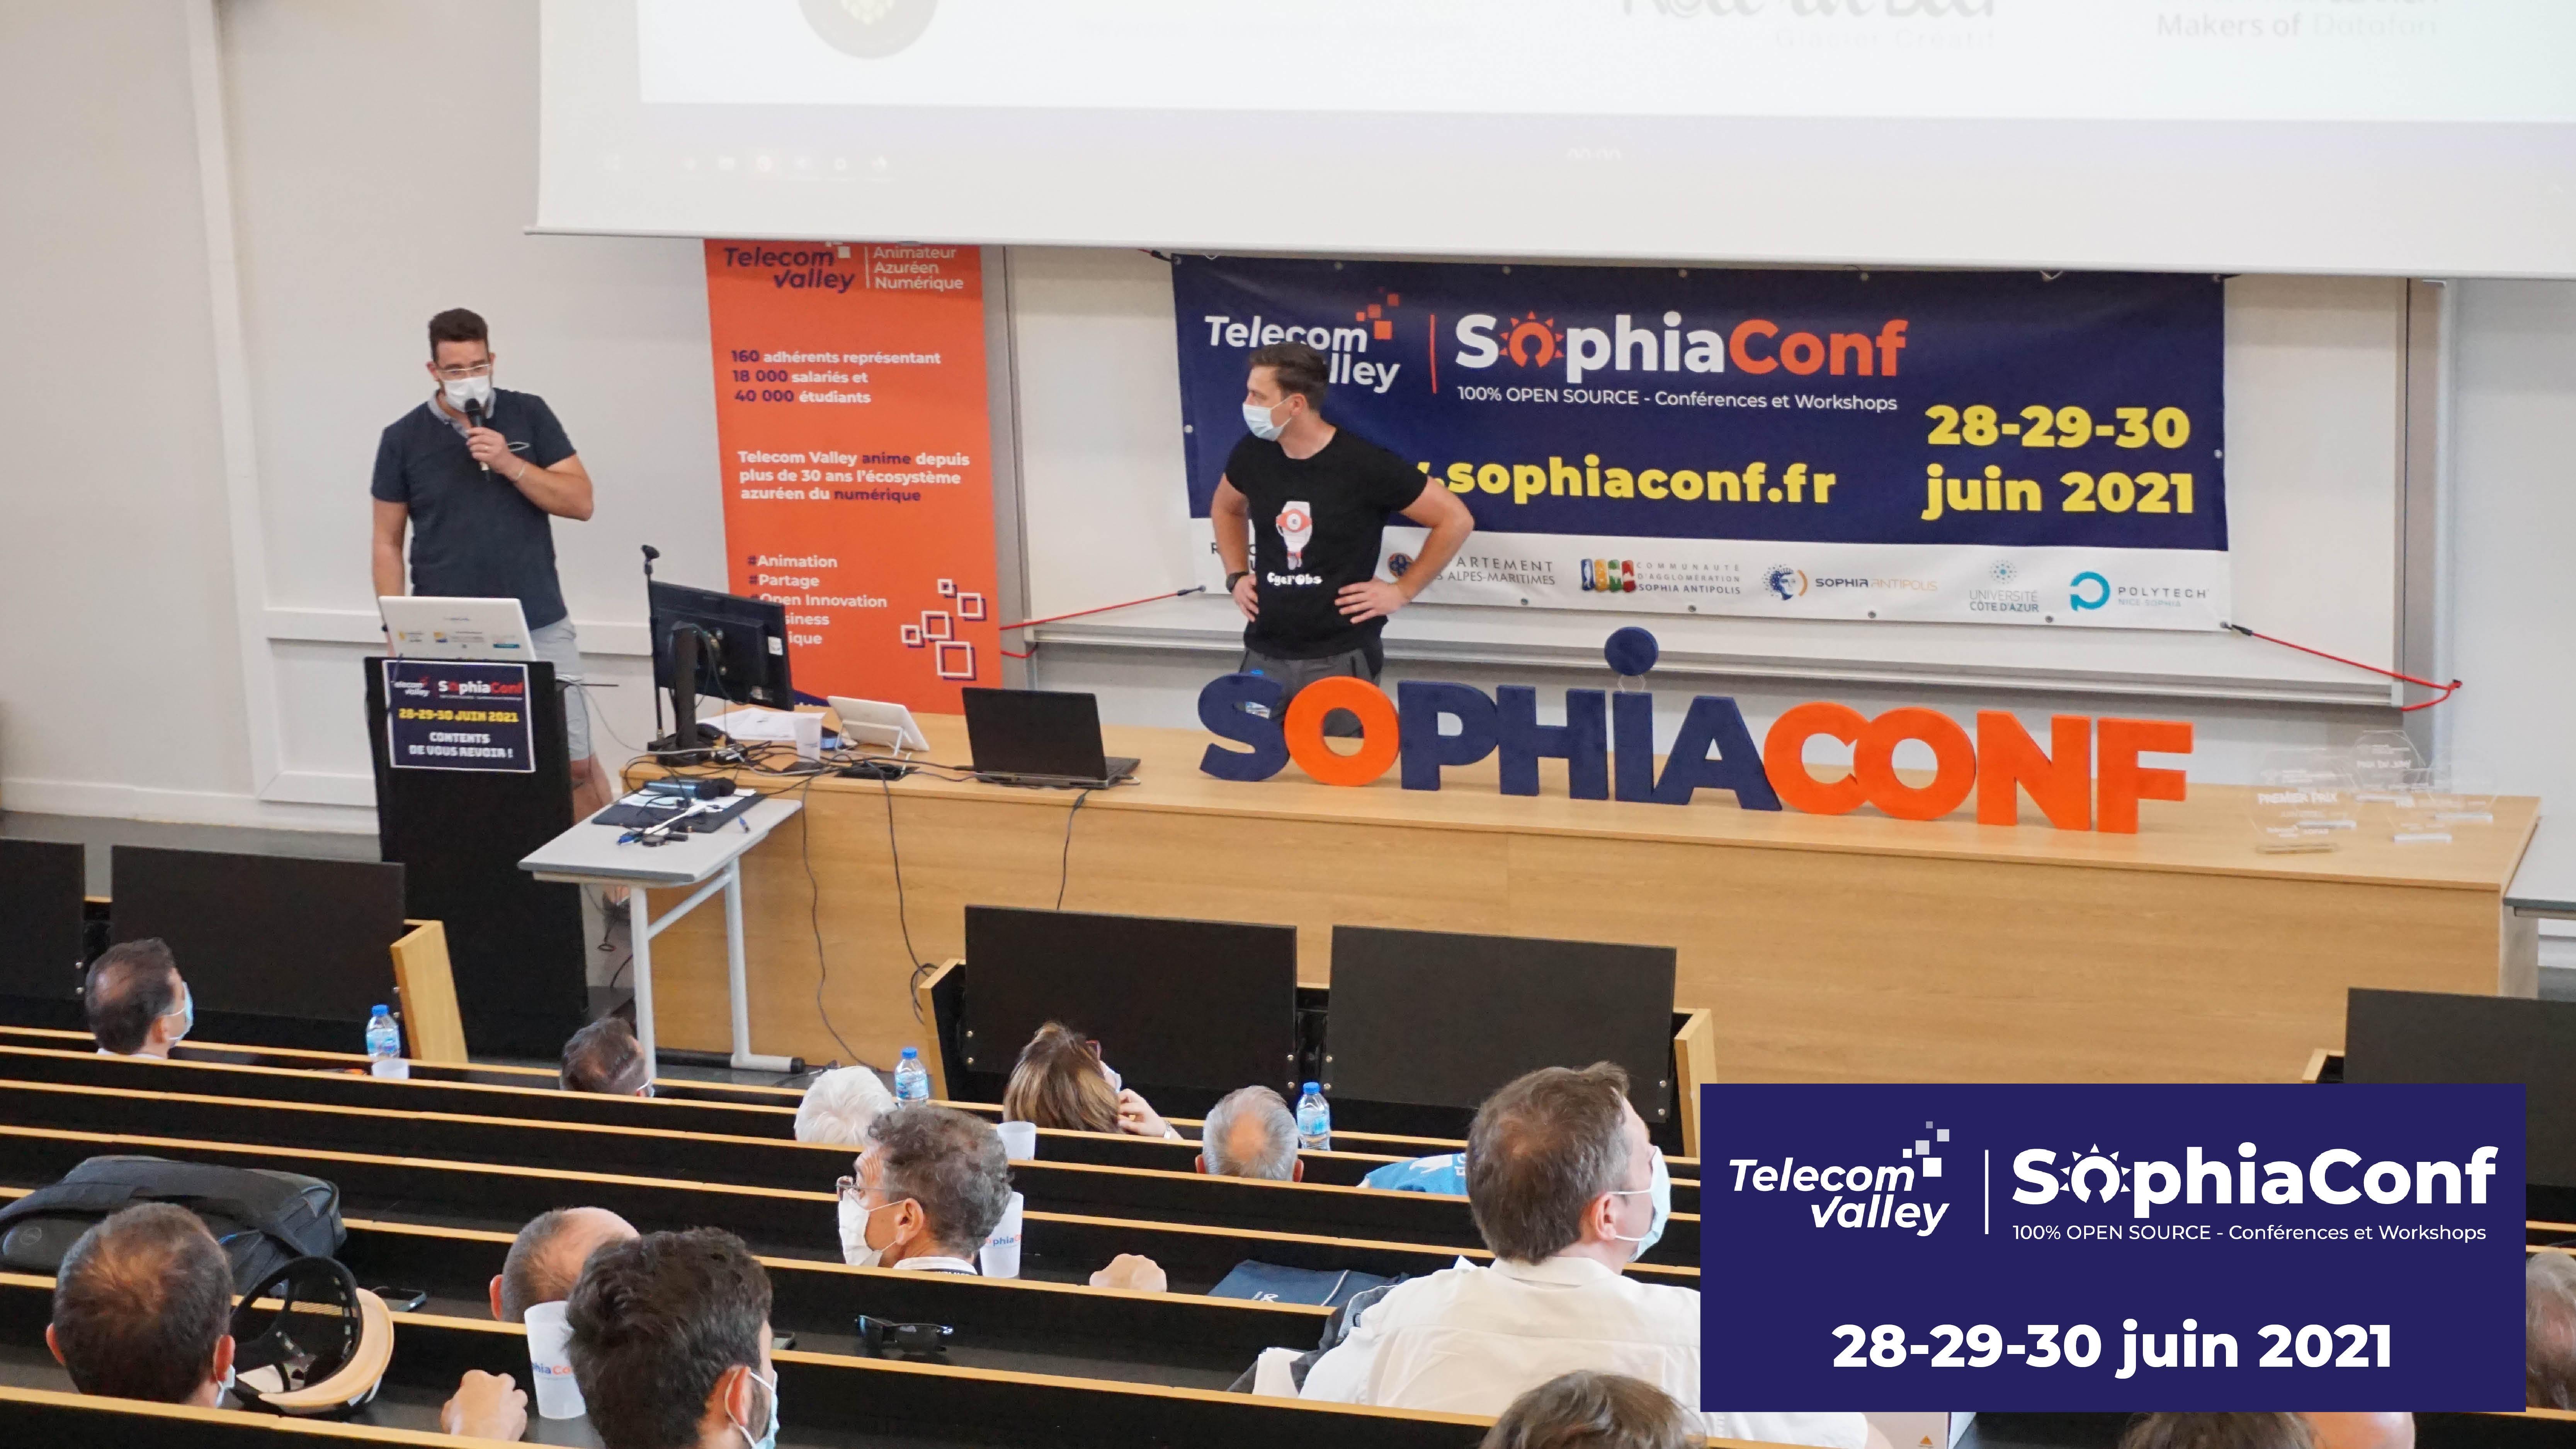 sophiaconf 2021 NL aout.jpg